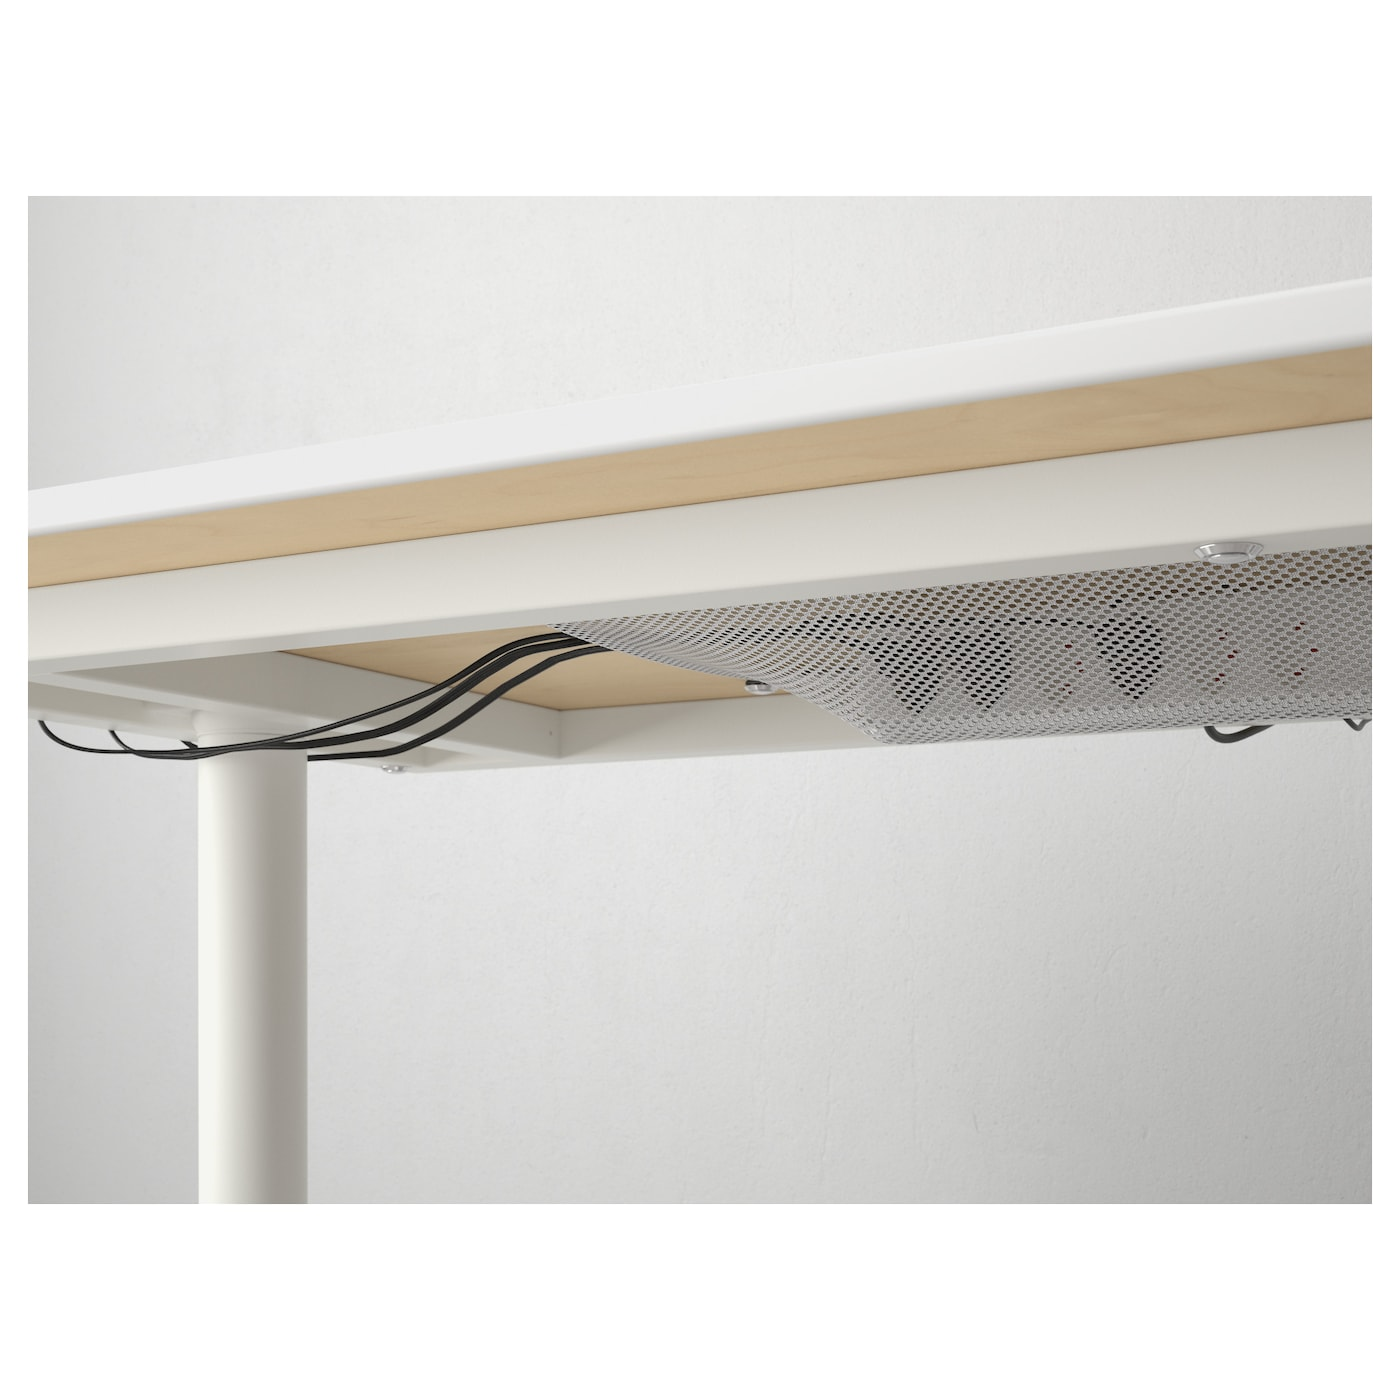 bekant bureau berkenfineer wit 140x60 cm ikea. Black Bedroom Furniture Sets. Home Design Ideas